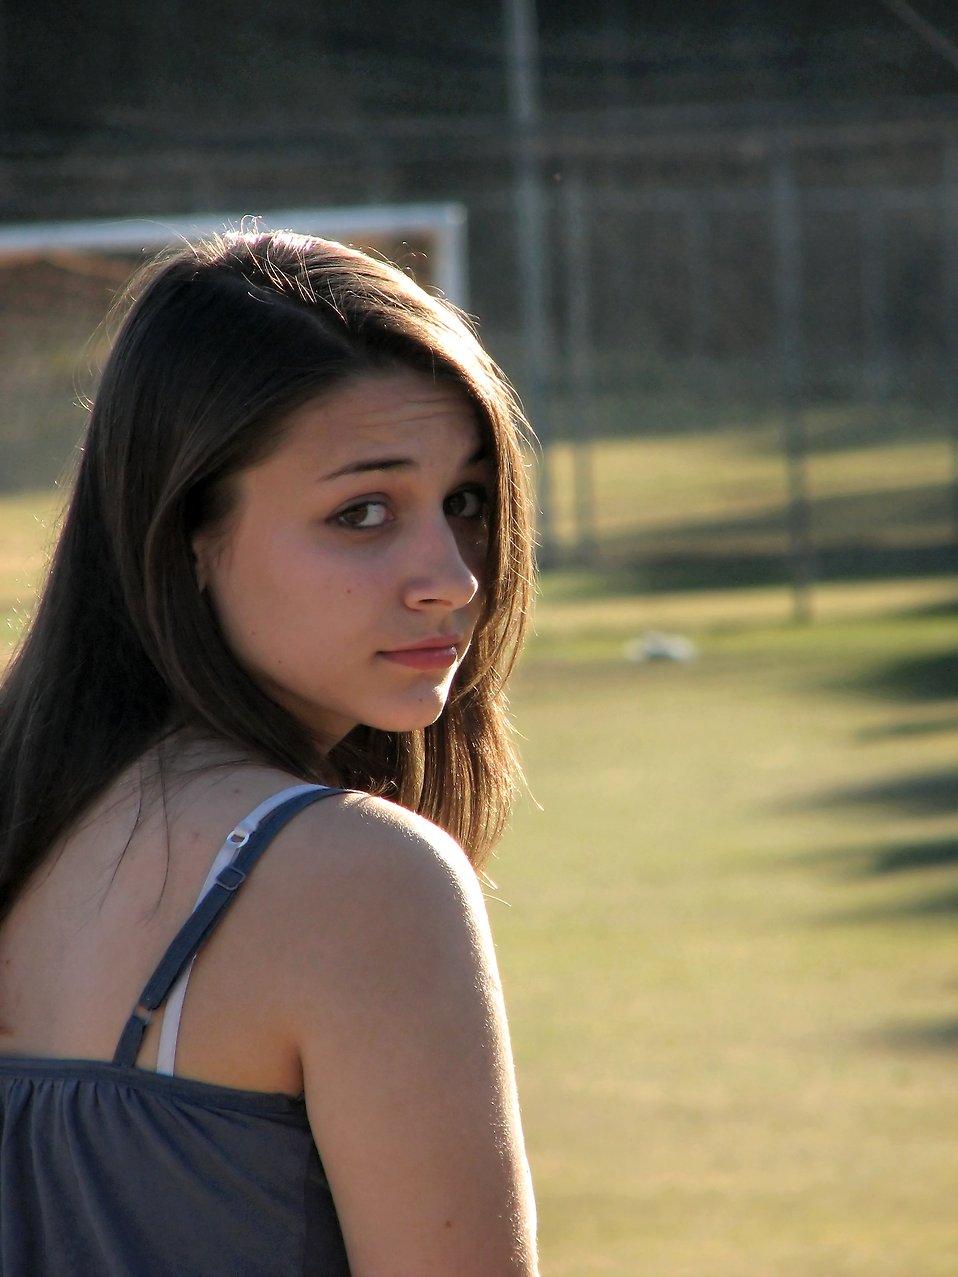 Girl Beautiful | Free Stock Photo | Outdoor portrait of a ... on Beautiful Teen Girl  id=30279